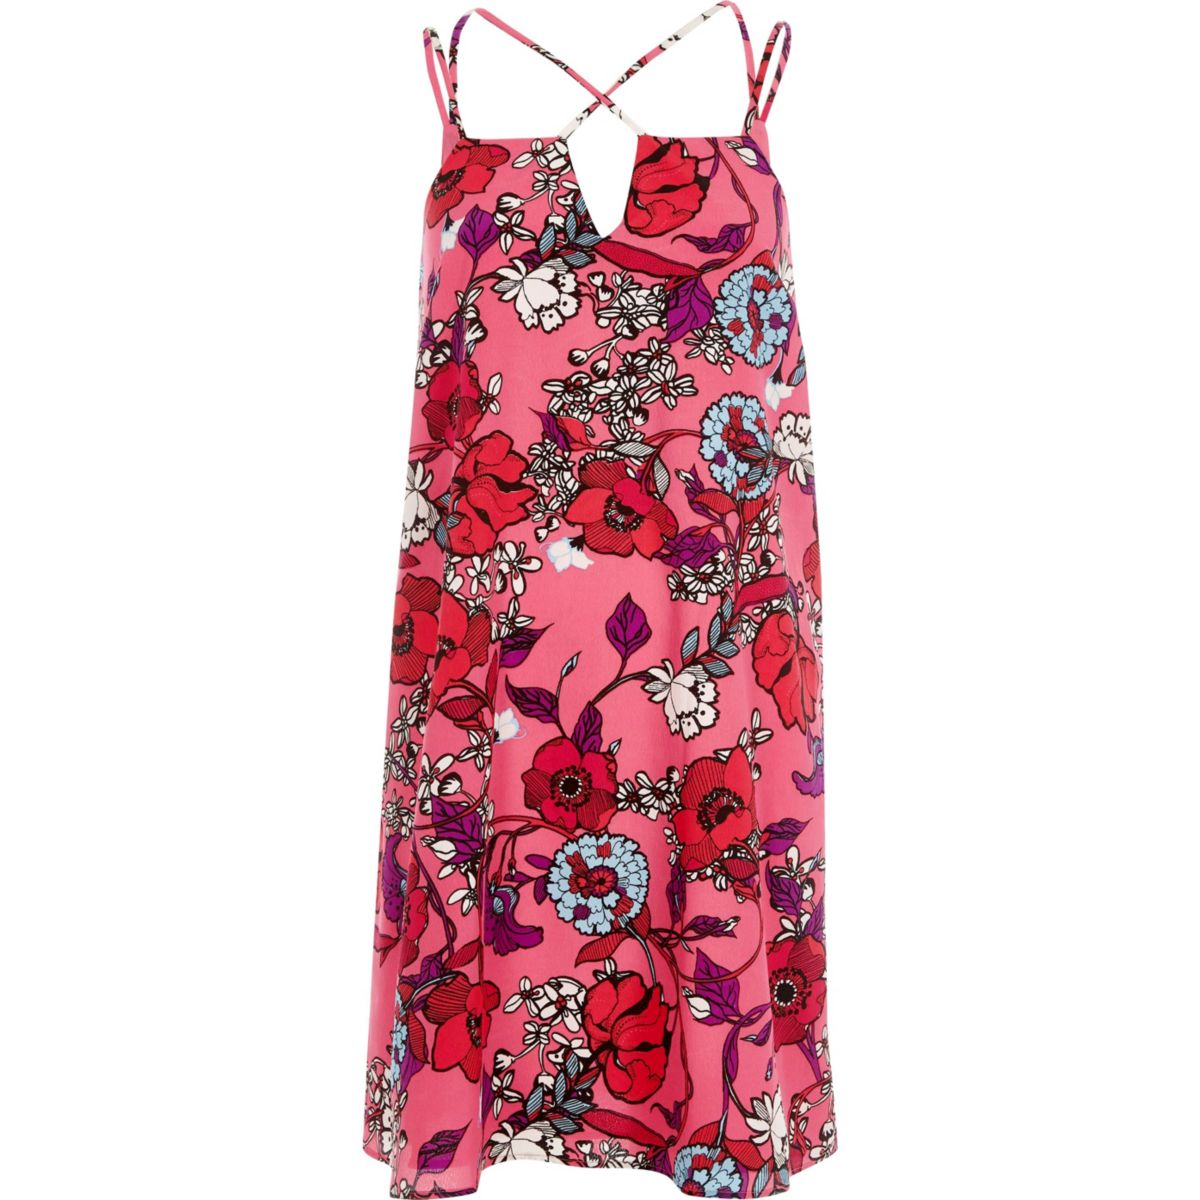 Pink floral print cross strap slip dress